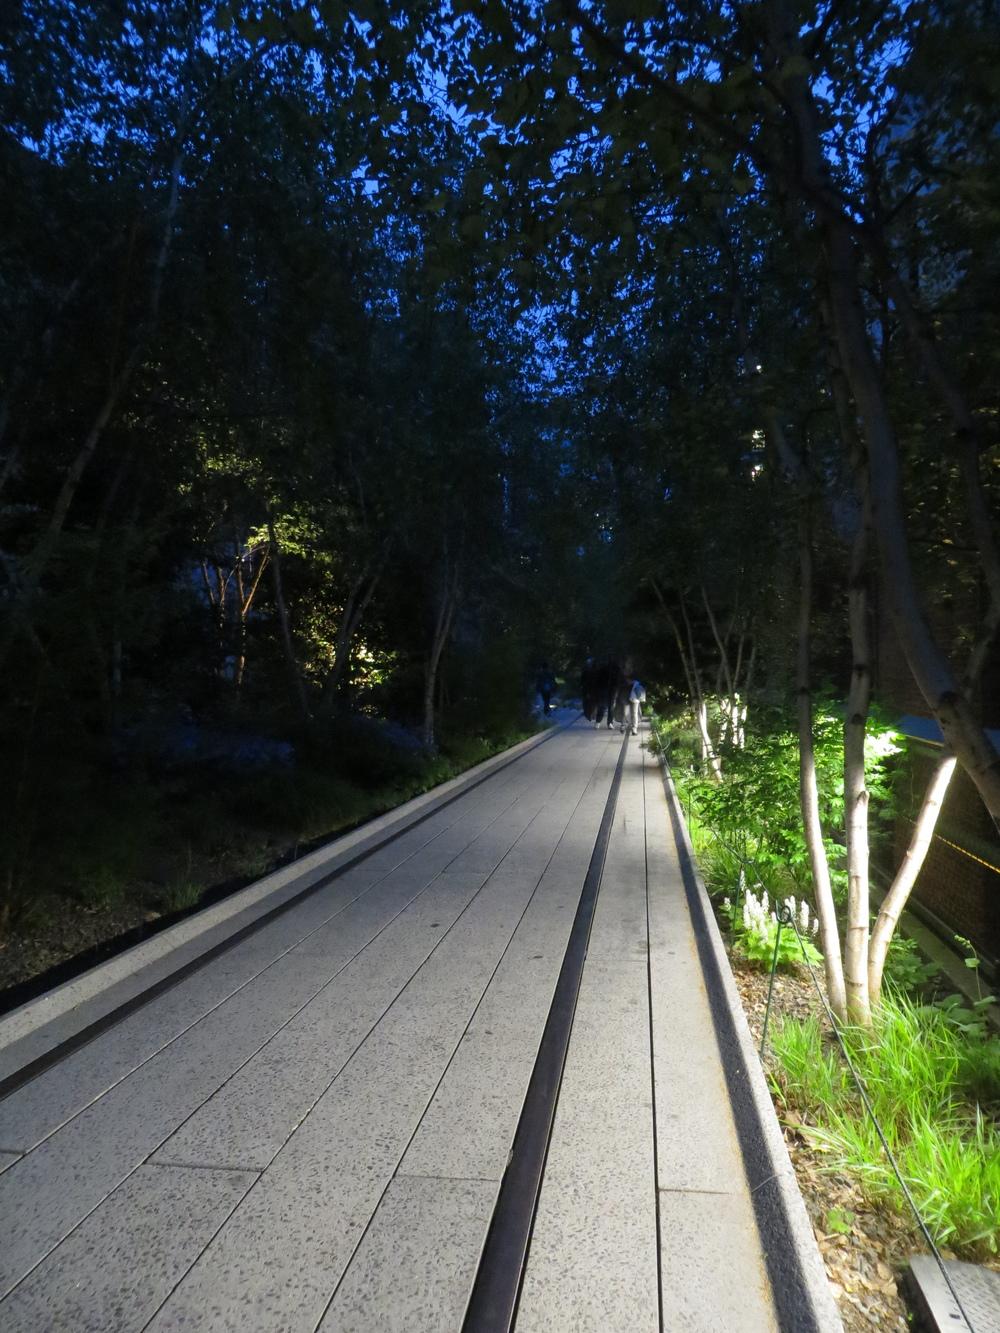 More path